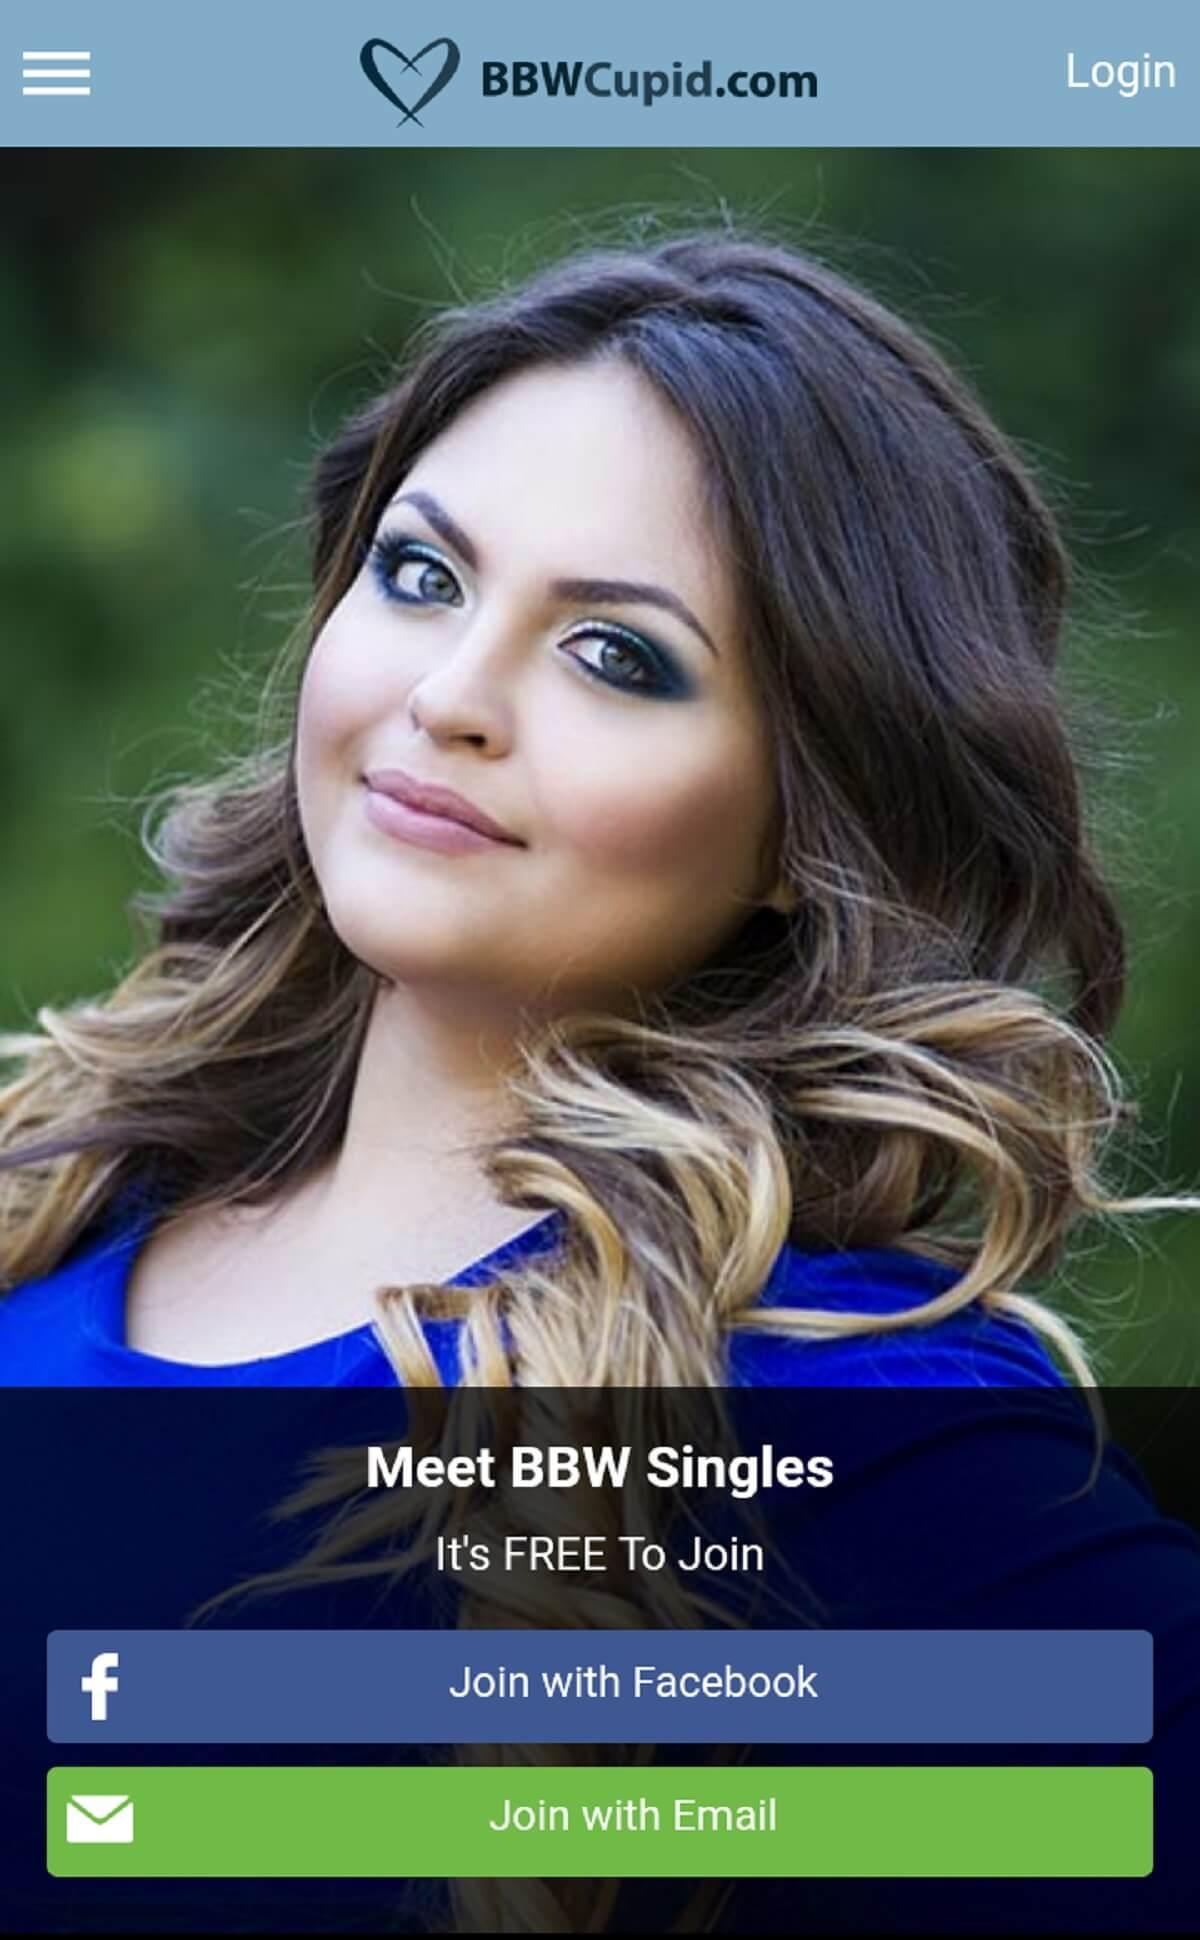 BBWCupid App